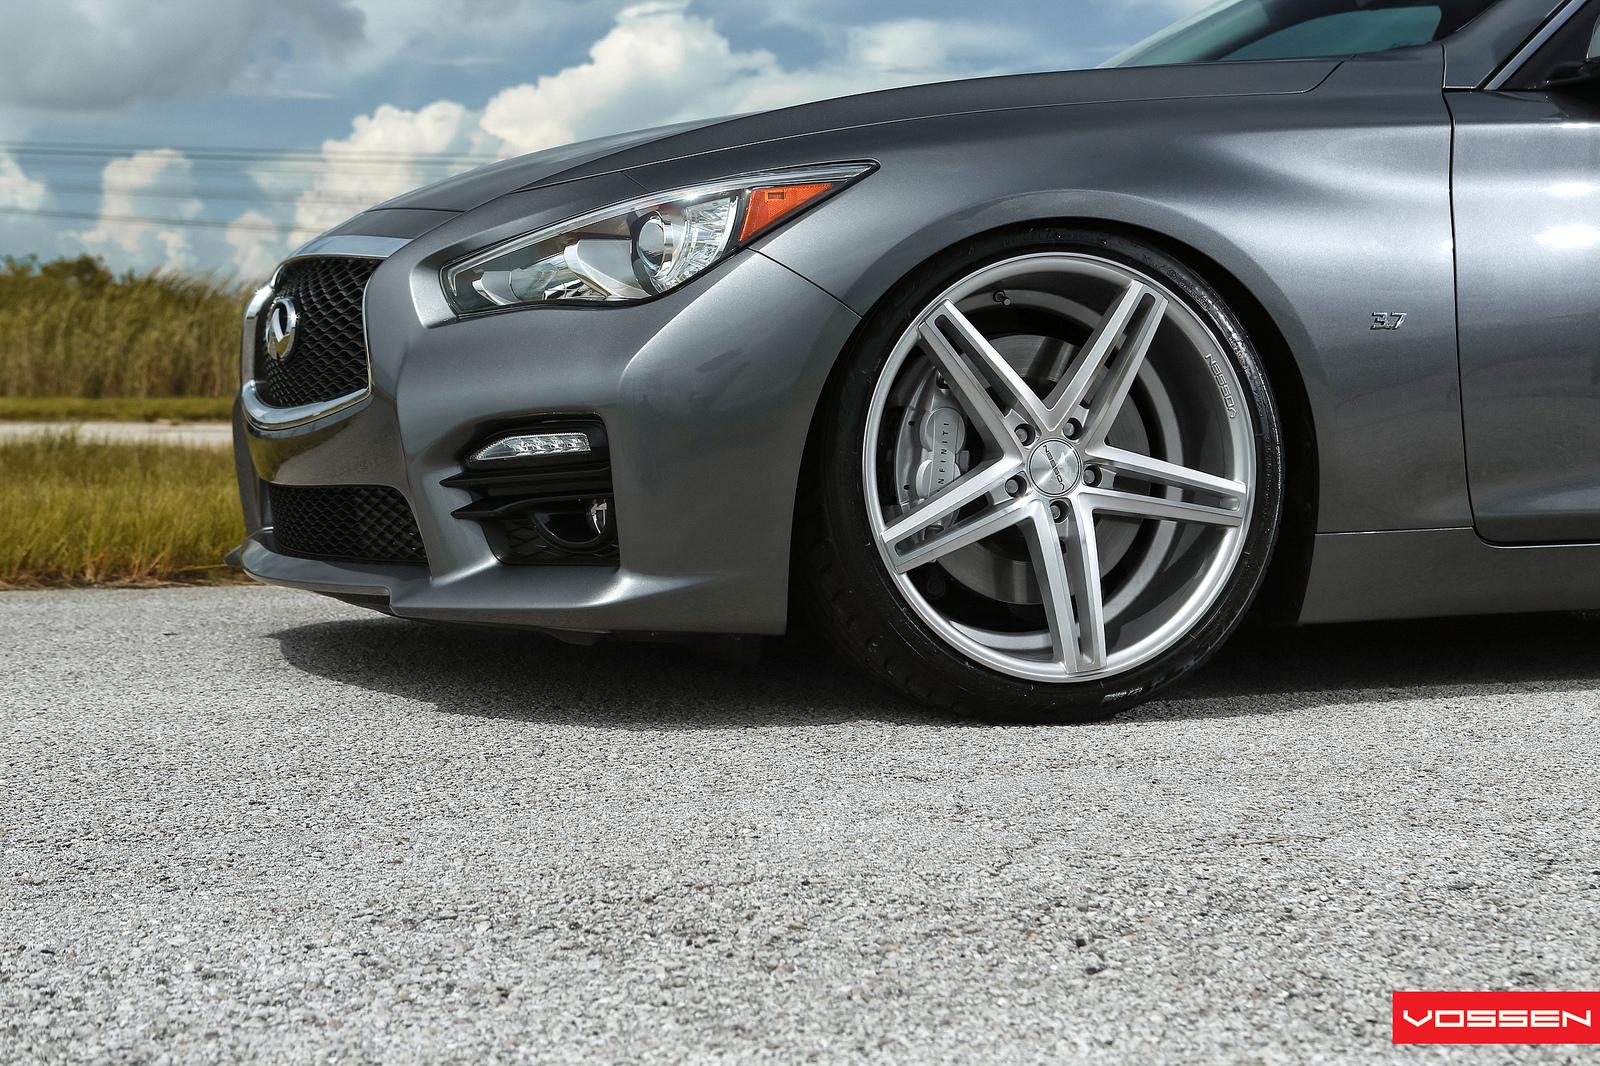 2014 infiniti q50 s on 20 vossen cv5 concave wheels rims